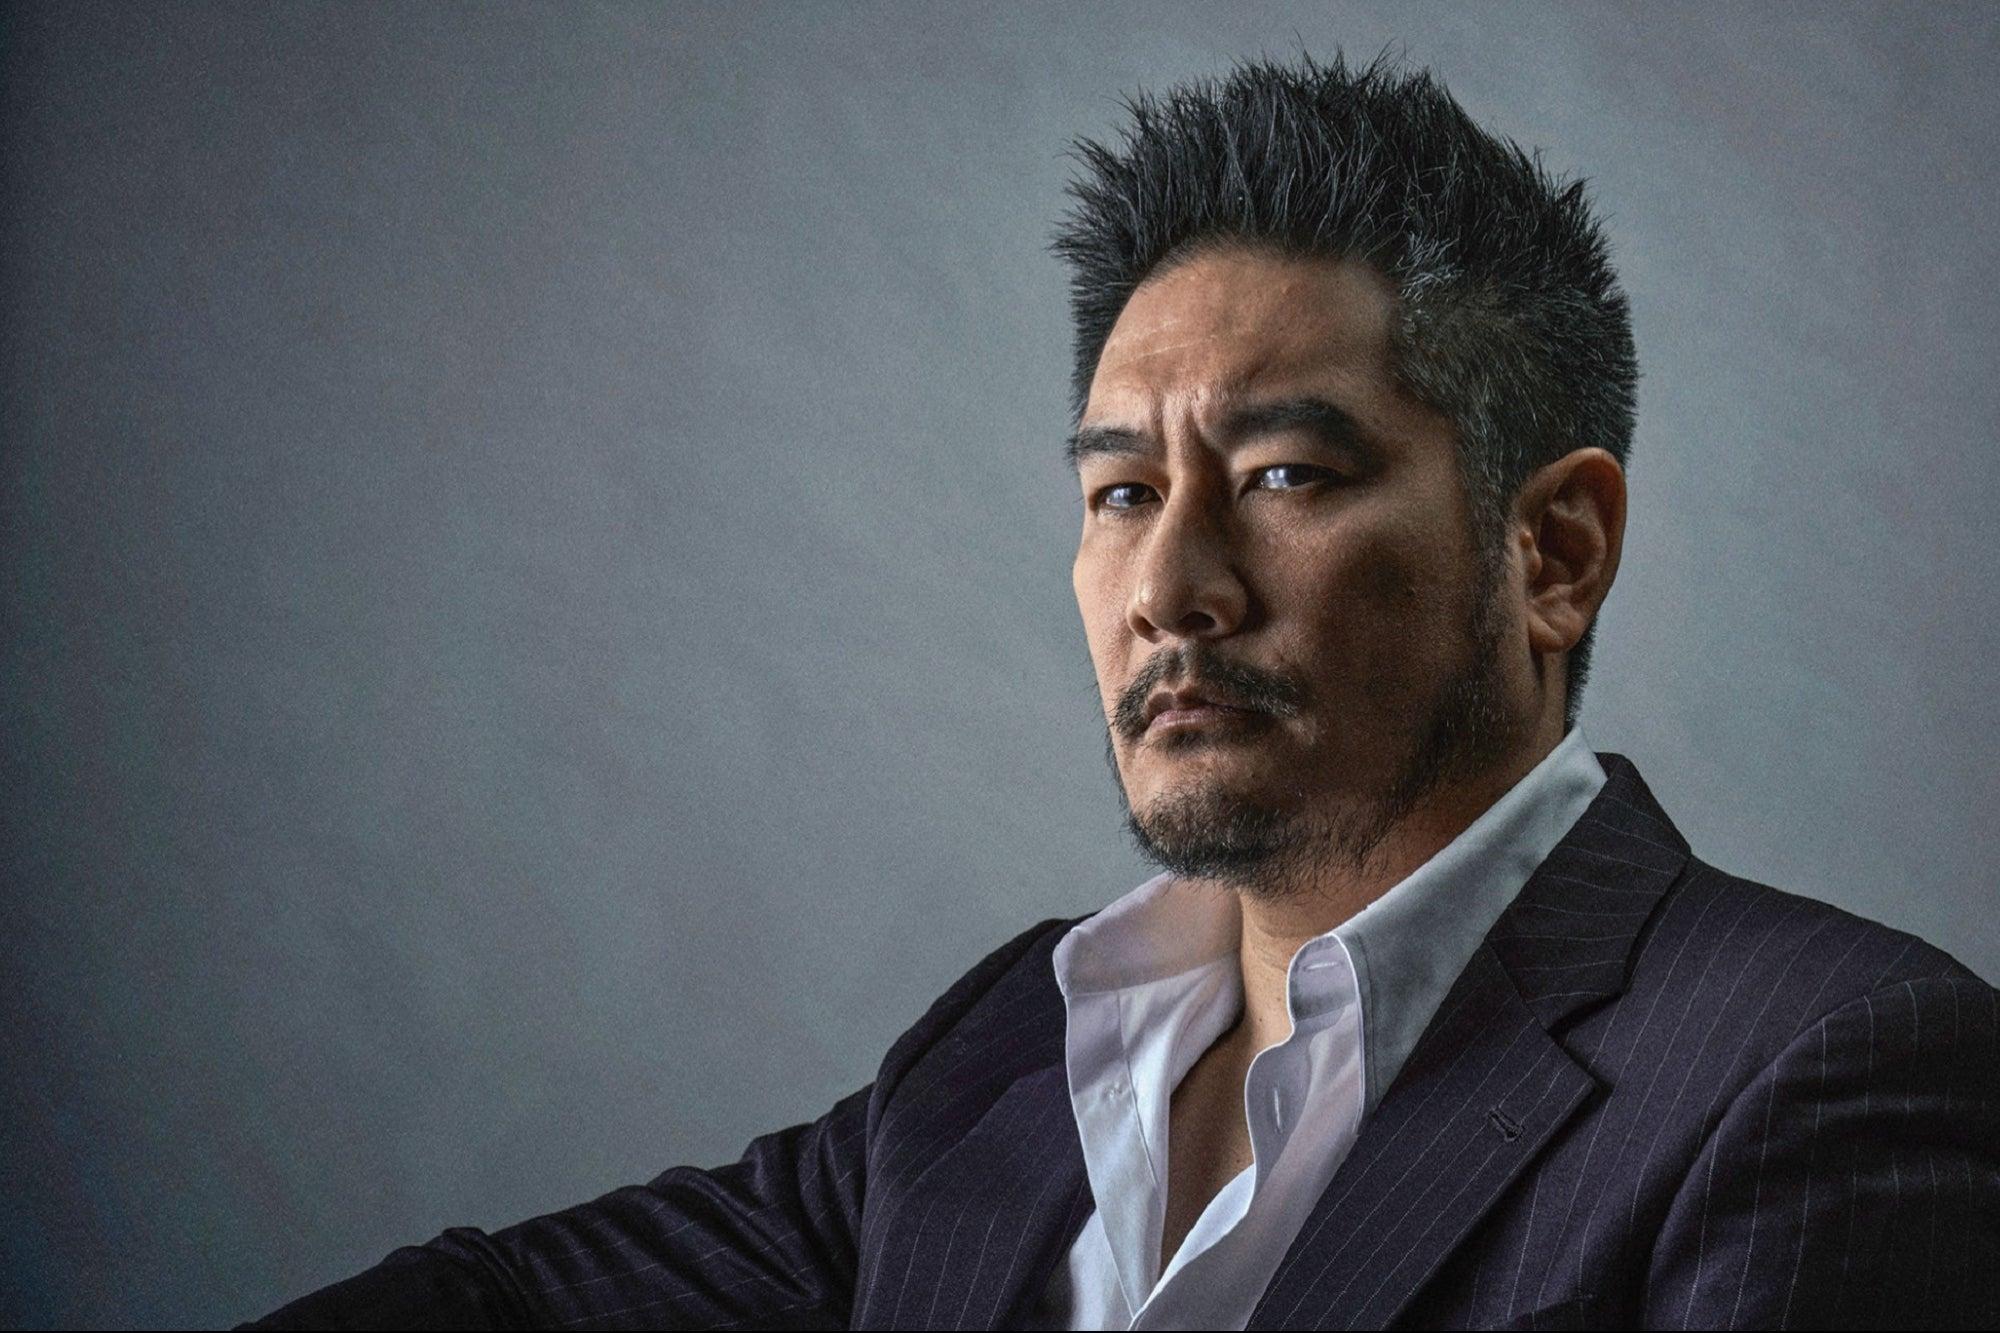 www.entrepreneur.com: The Asian Champion